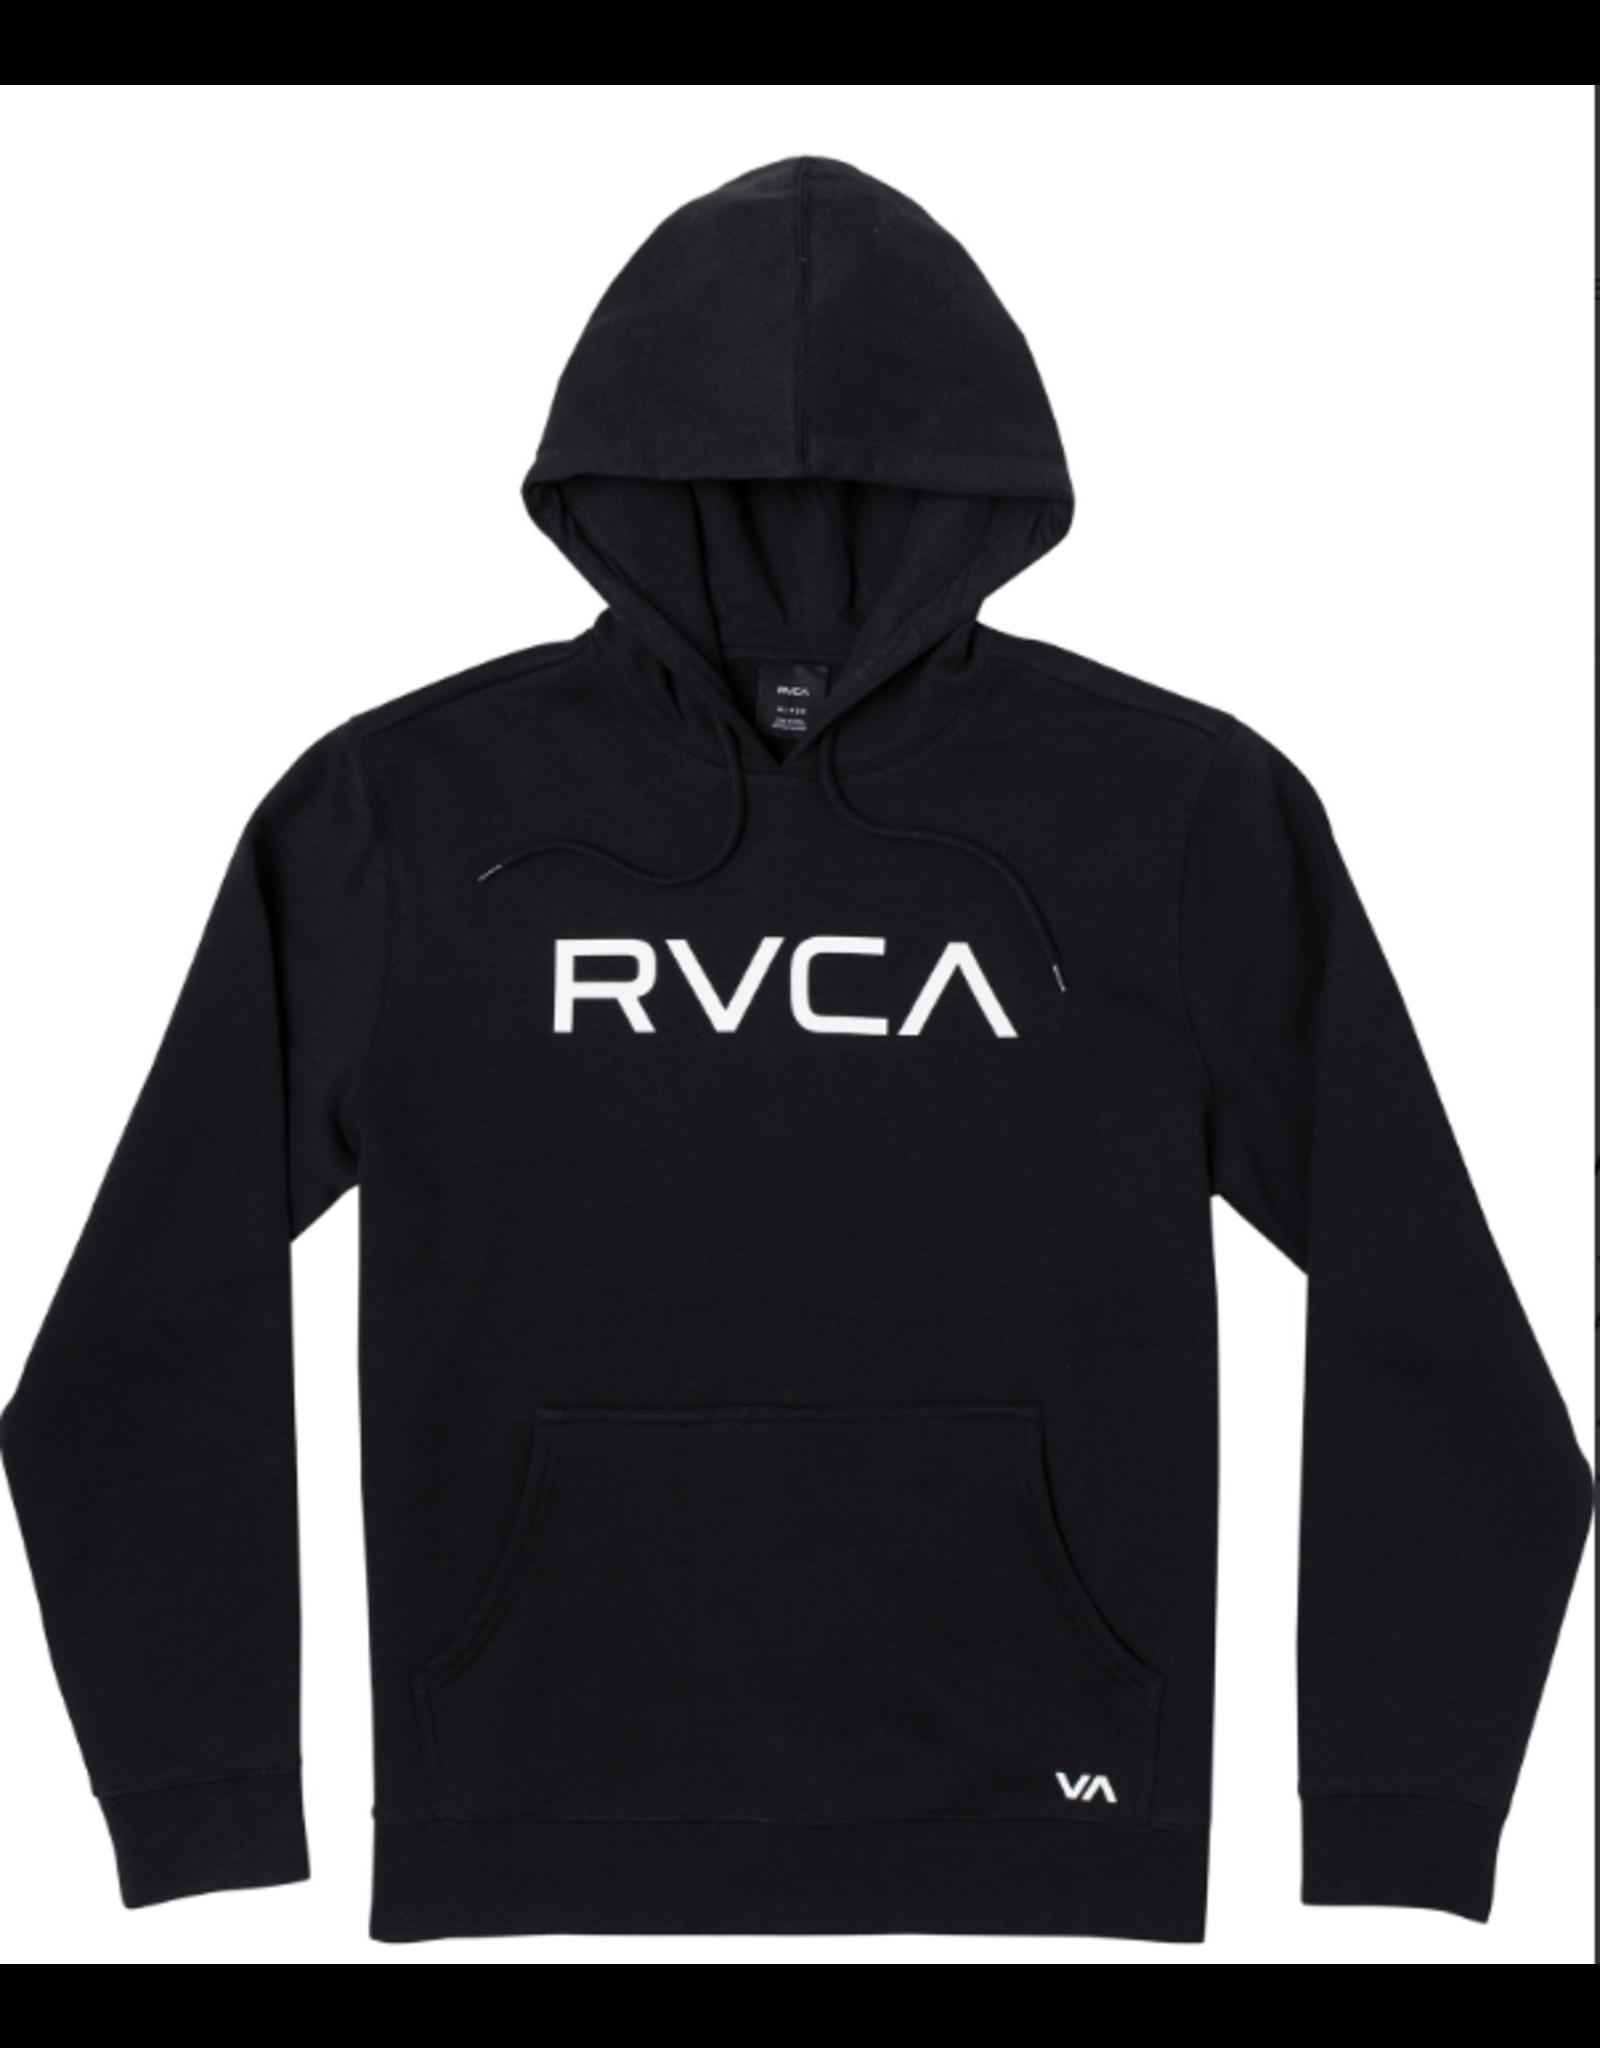 RVCA RVCA Big Hoodie